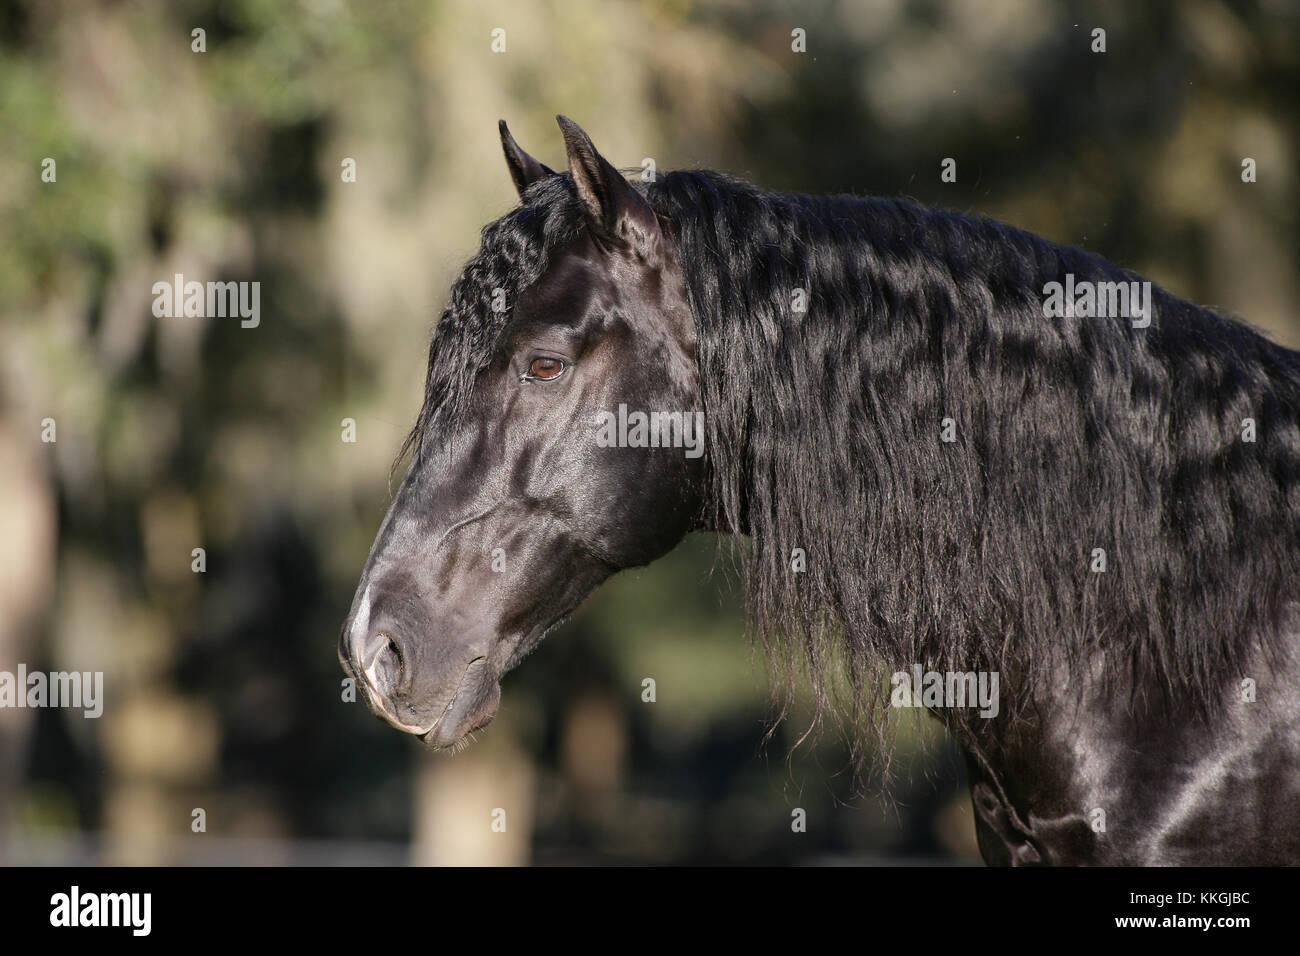 Lusitano Stallion Headshot - Stock Image